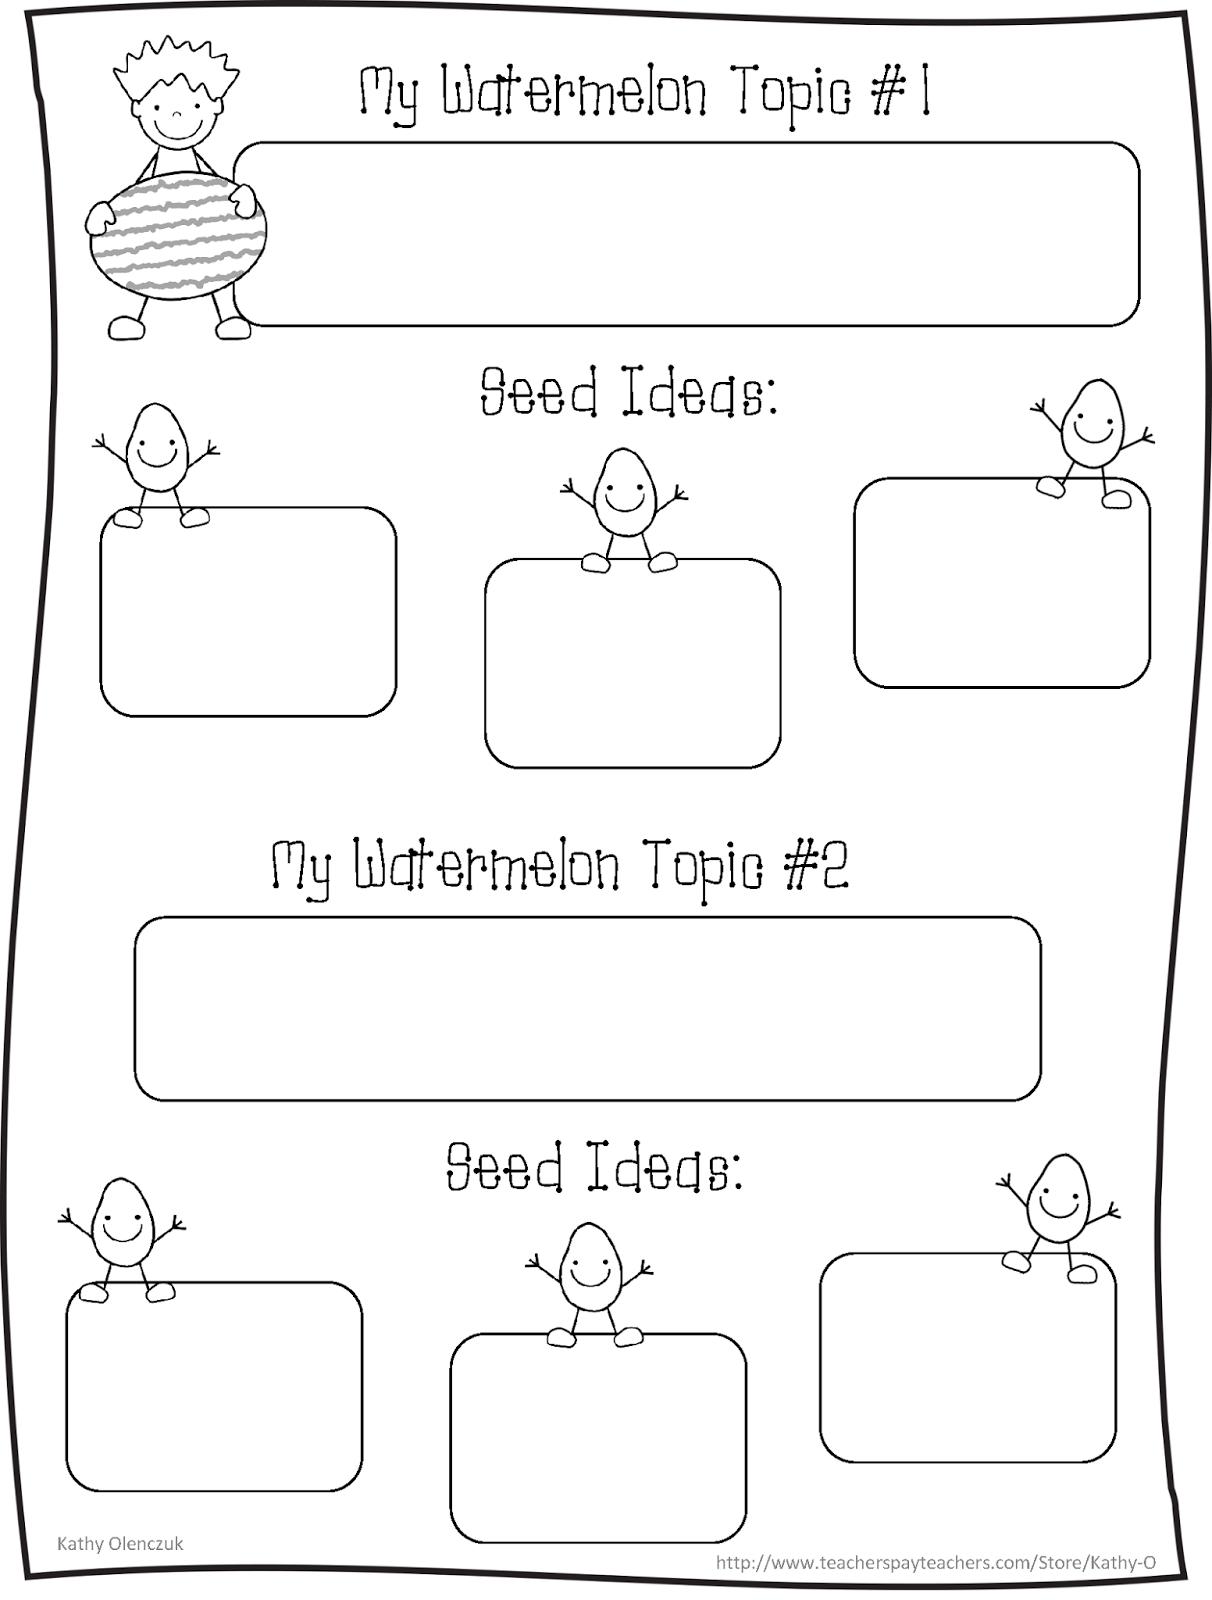 hight resolution of Descriptive Writing Activities For Third Grade